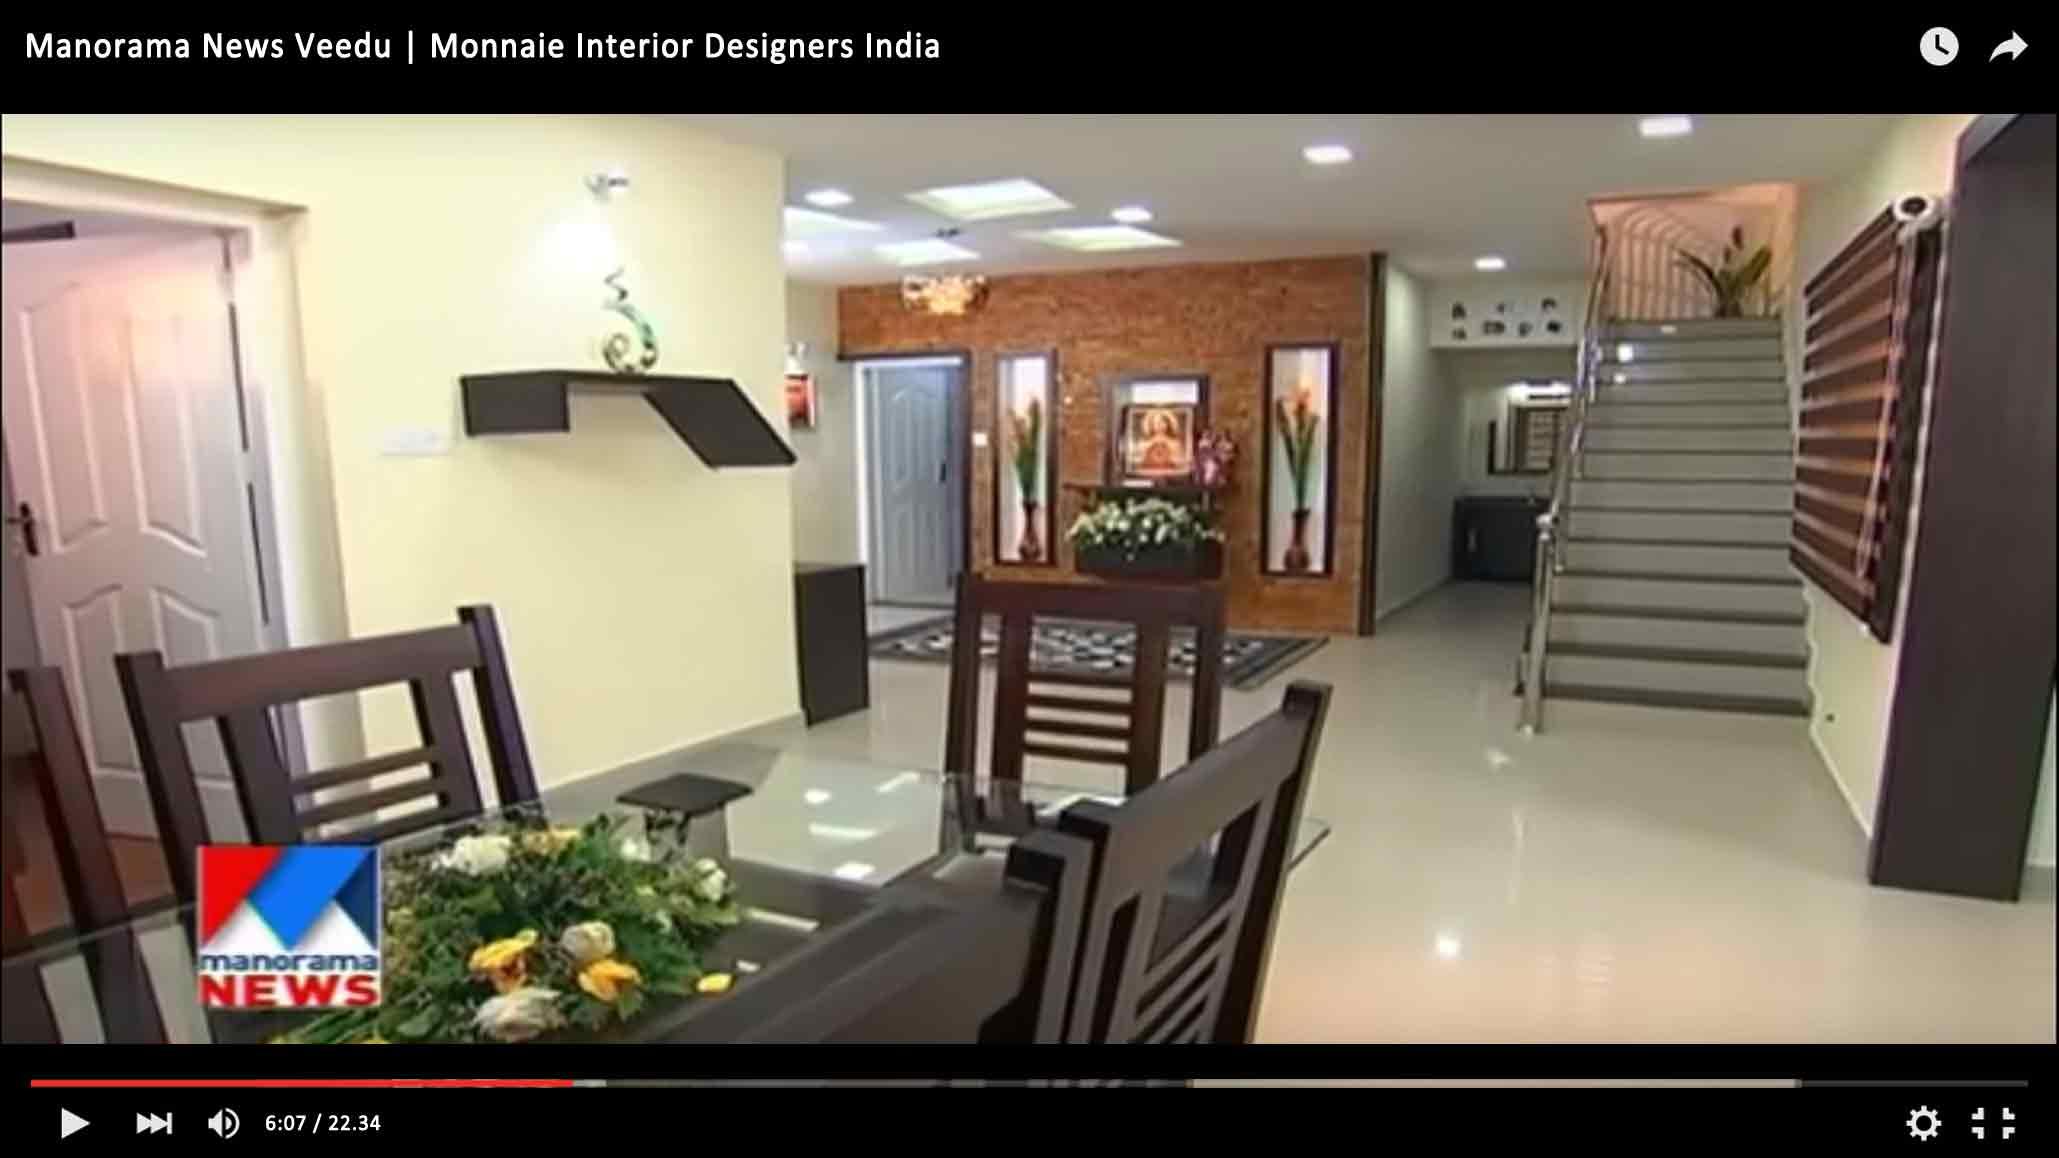 Best architects in kochi kerala top interior designers - Budget interior designers in bangalore ...